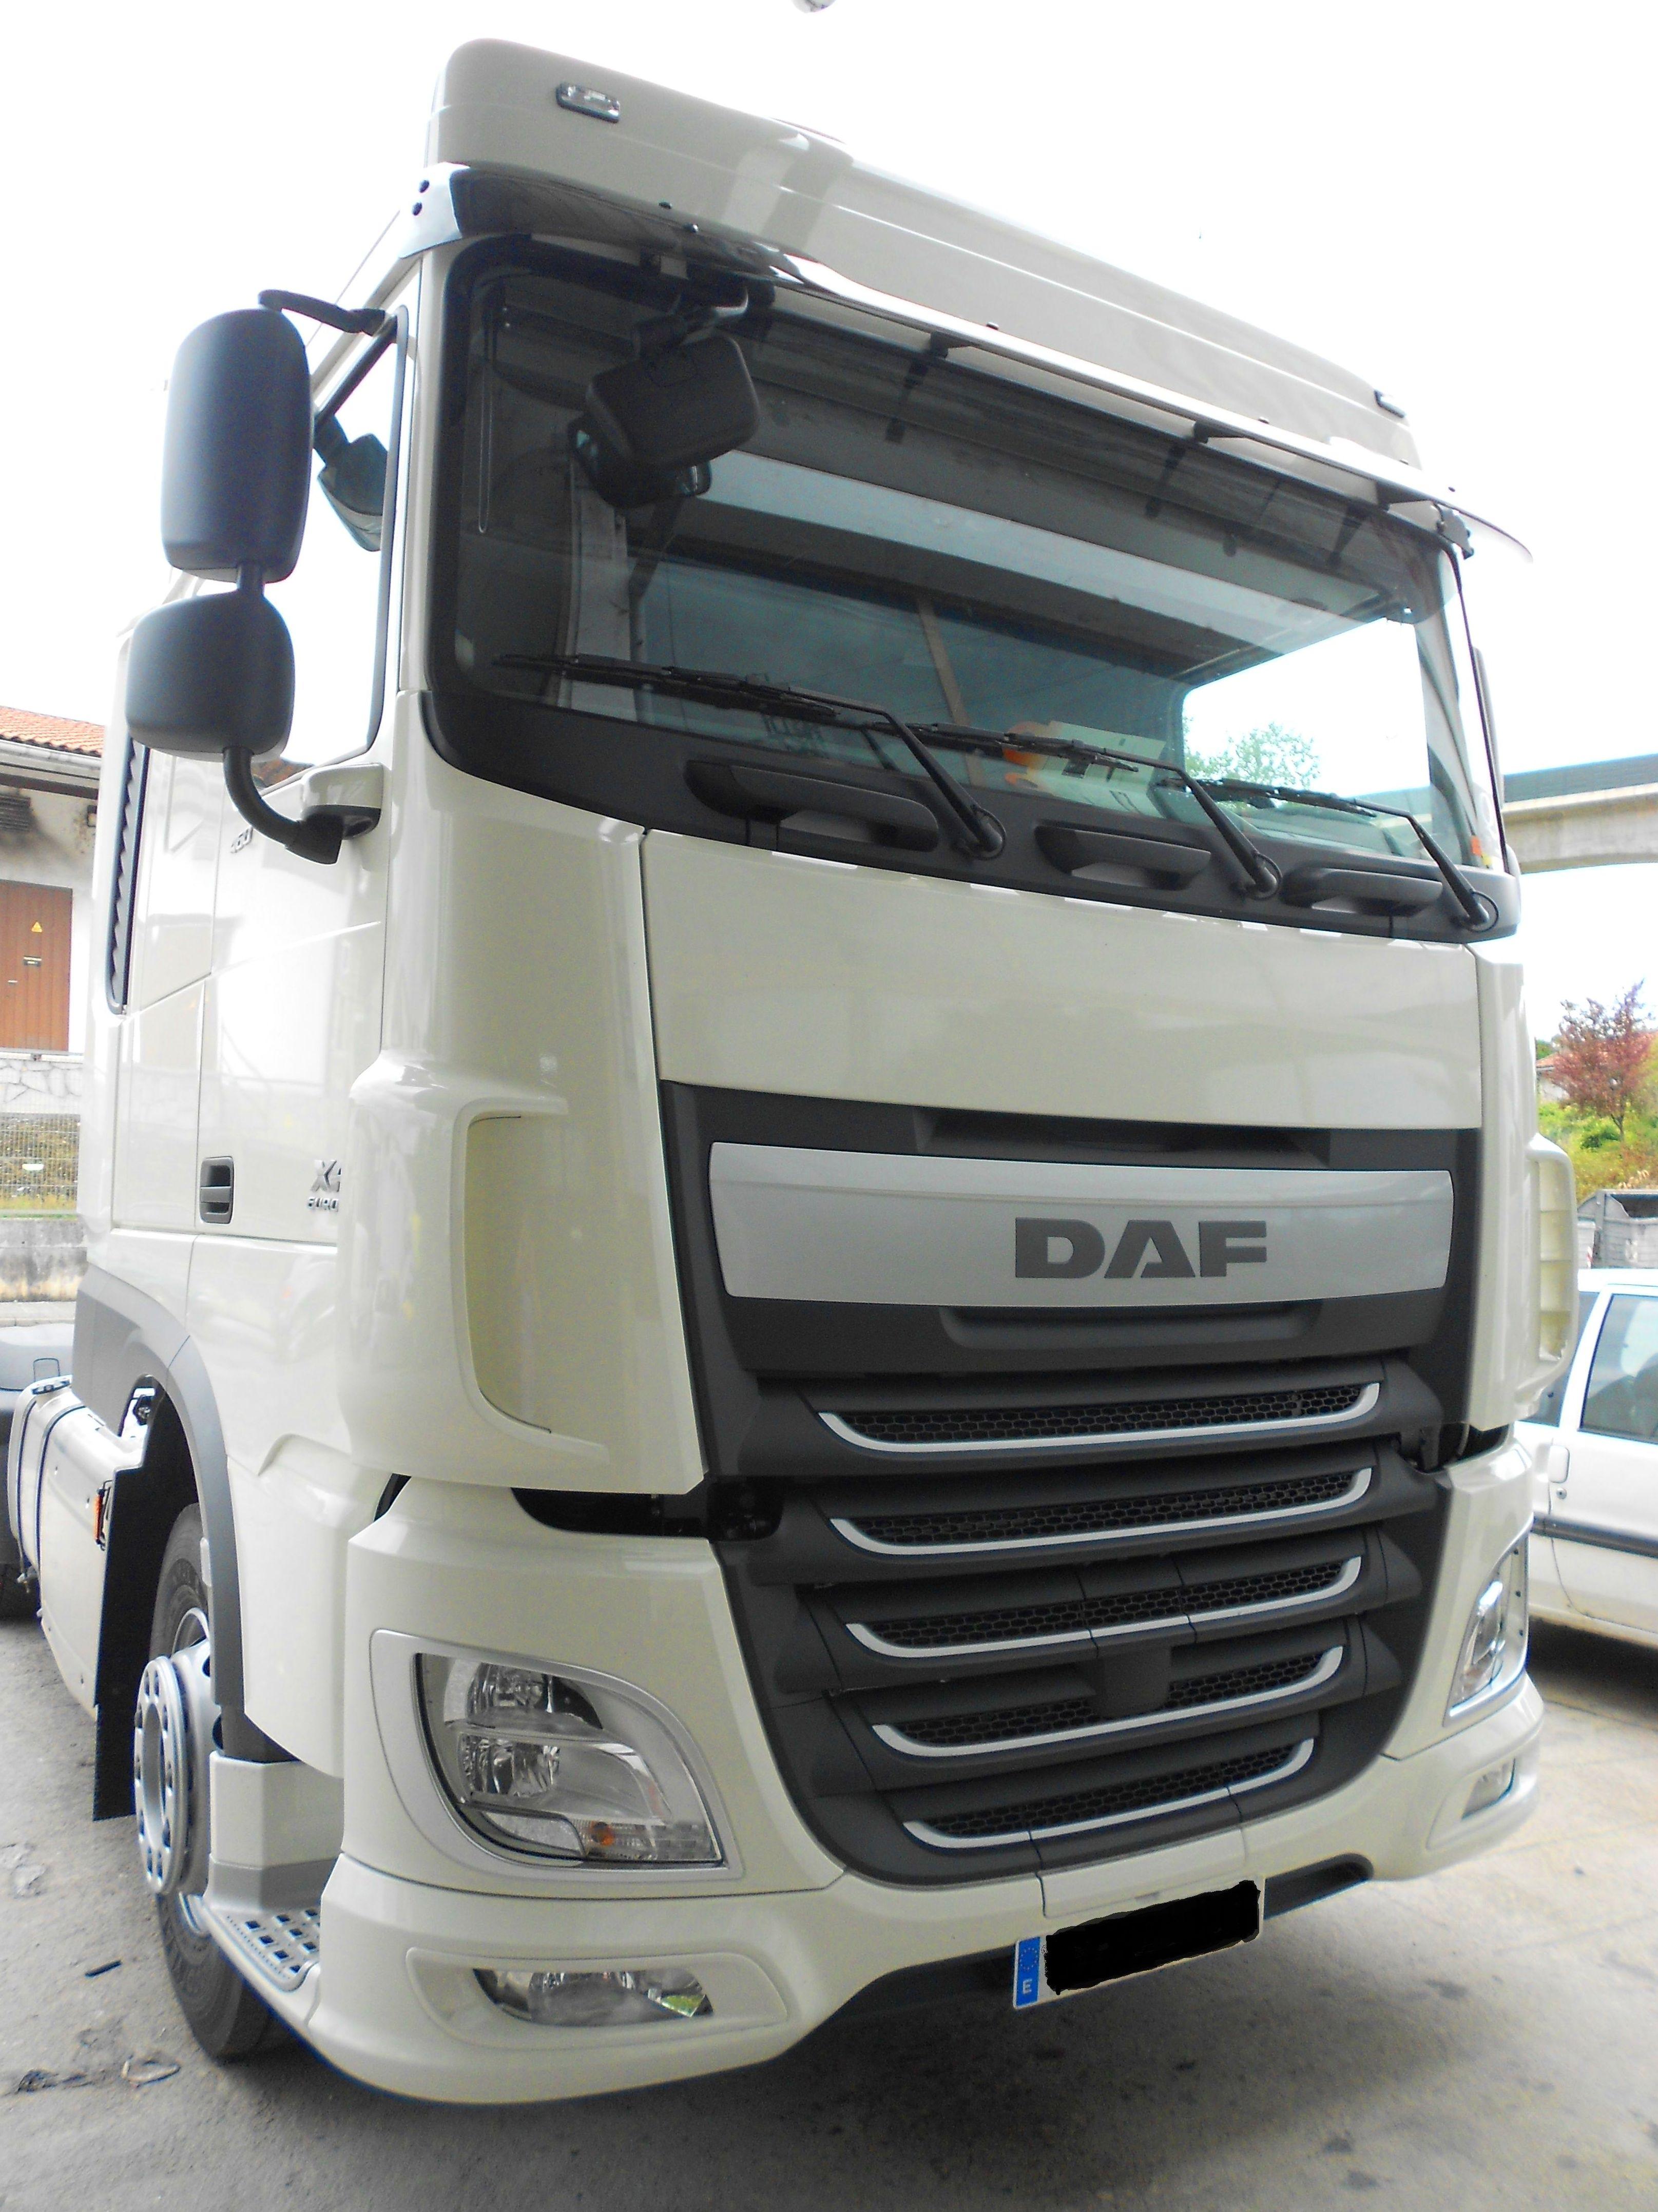 Camión Daf sin rotular